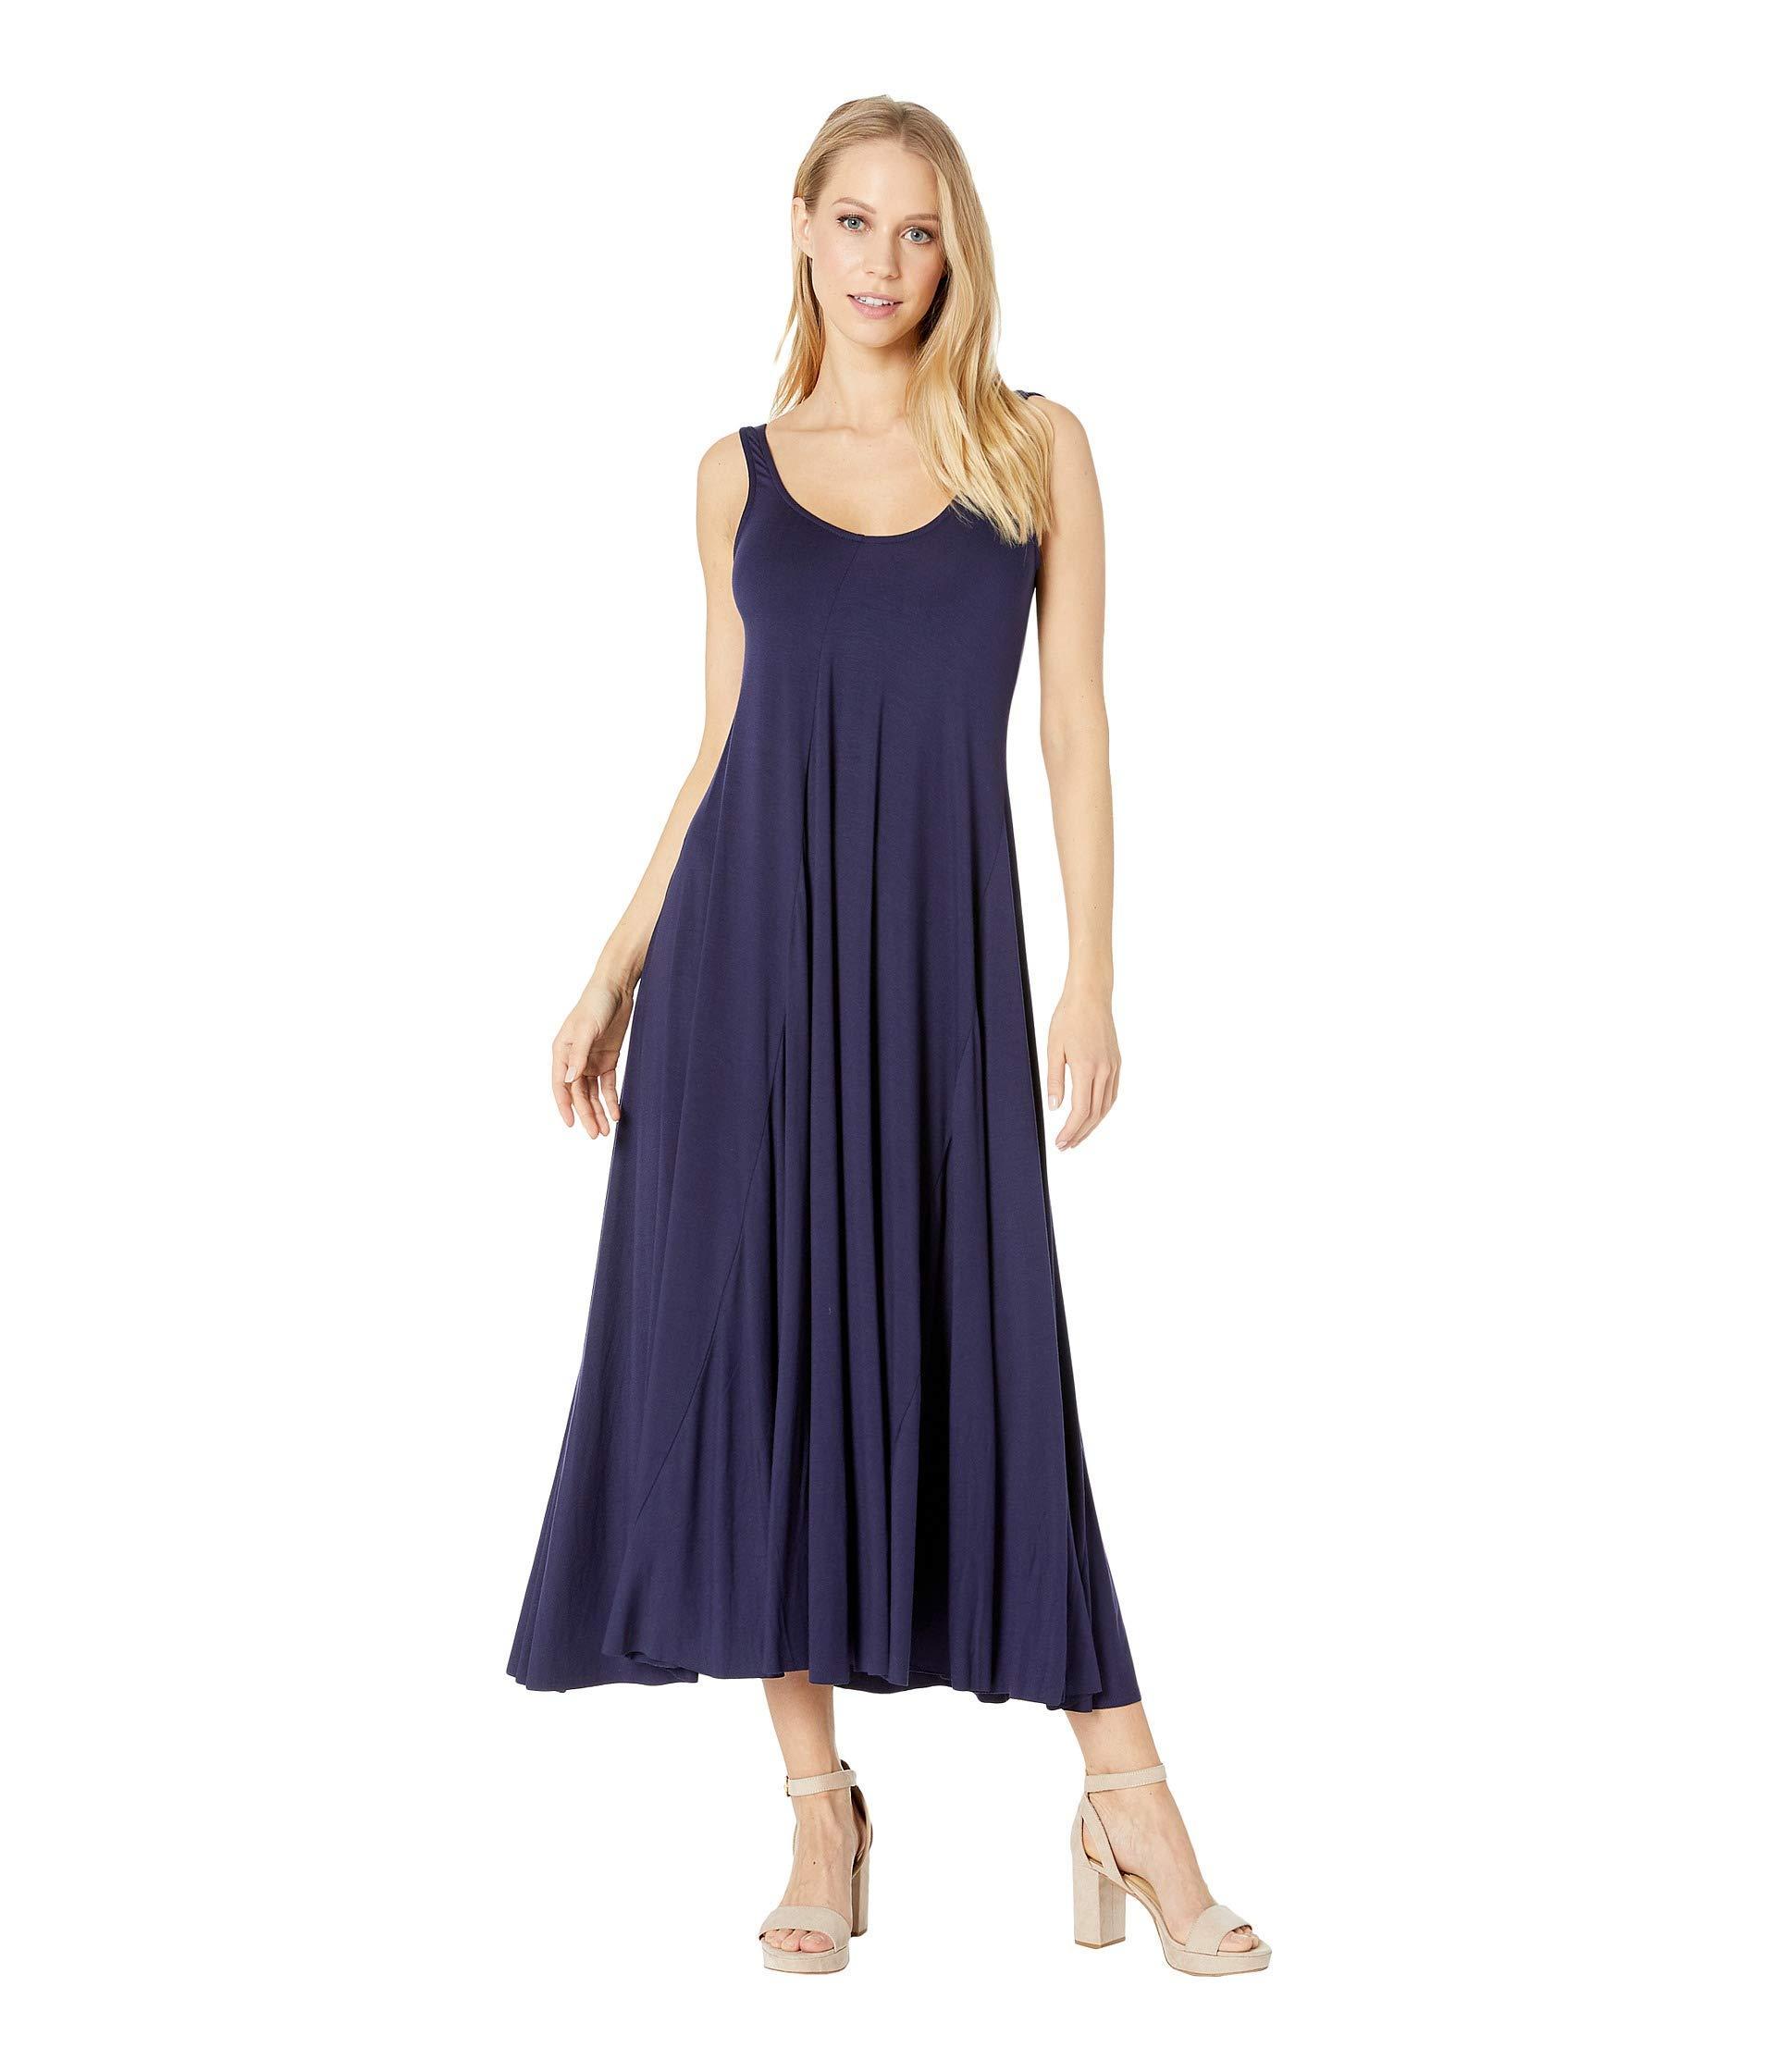 2f0faf9fb8 Lyst - Rachel Pally Nora Dress (cove) Women s Dress in Blue